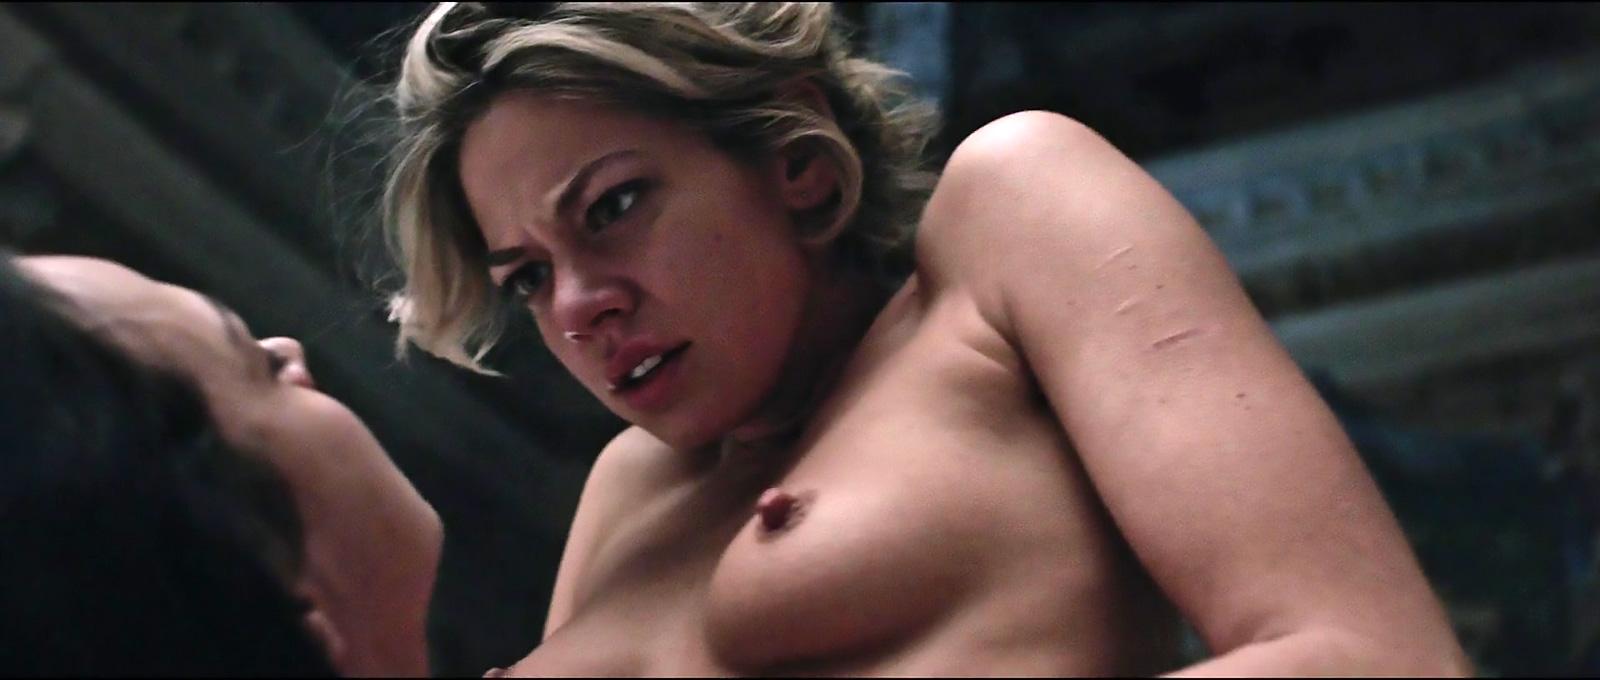 Analeigh Tipton Sex analeigh tipton lesbian sex scene in compulsion (2016